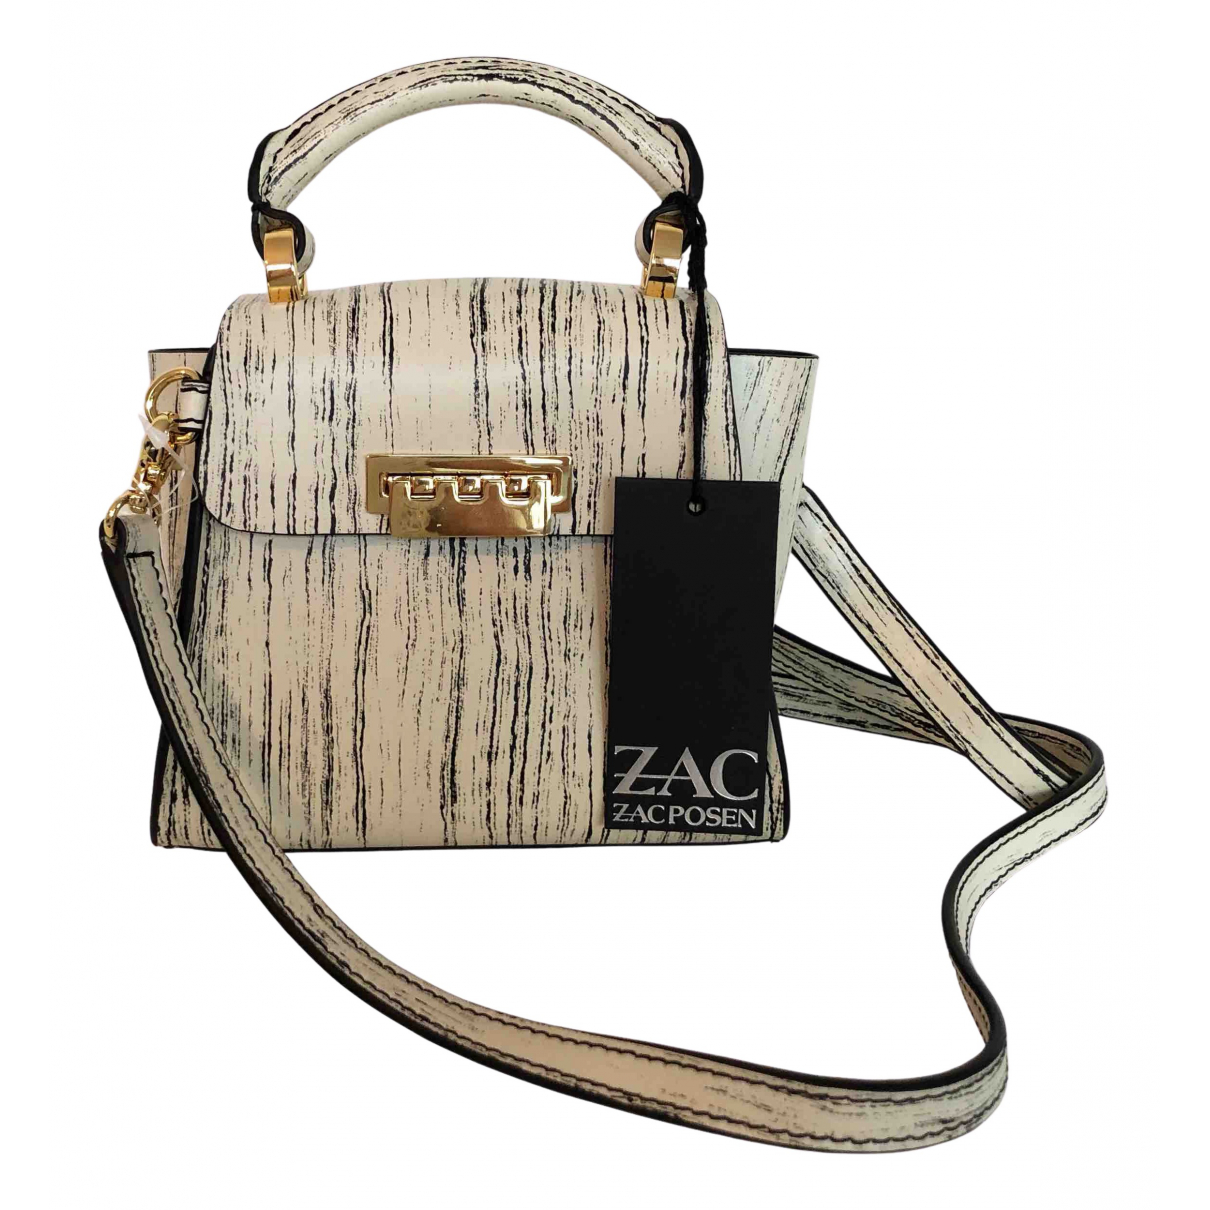 Zac Posen \N Handtasche in  Beige Leder